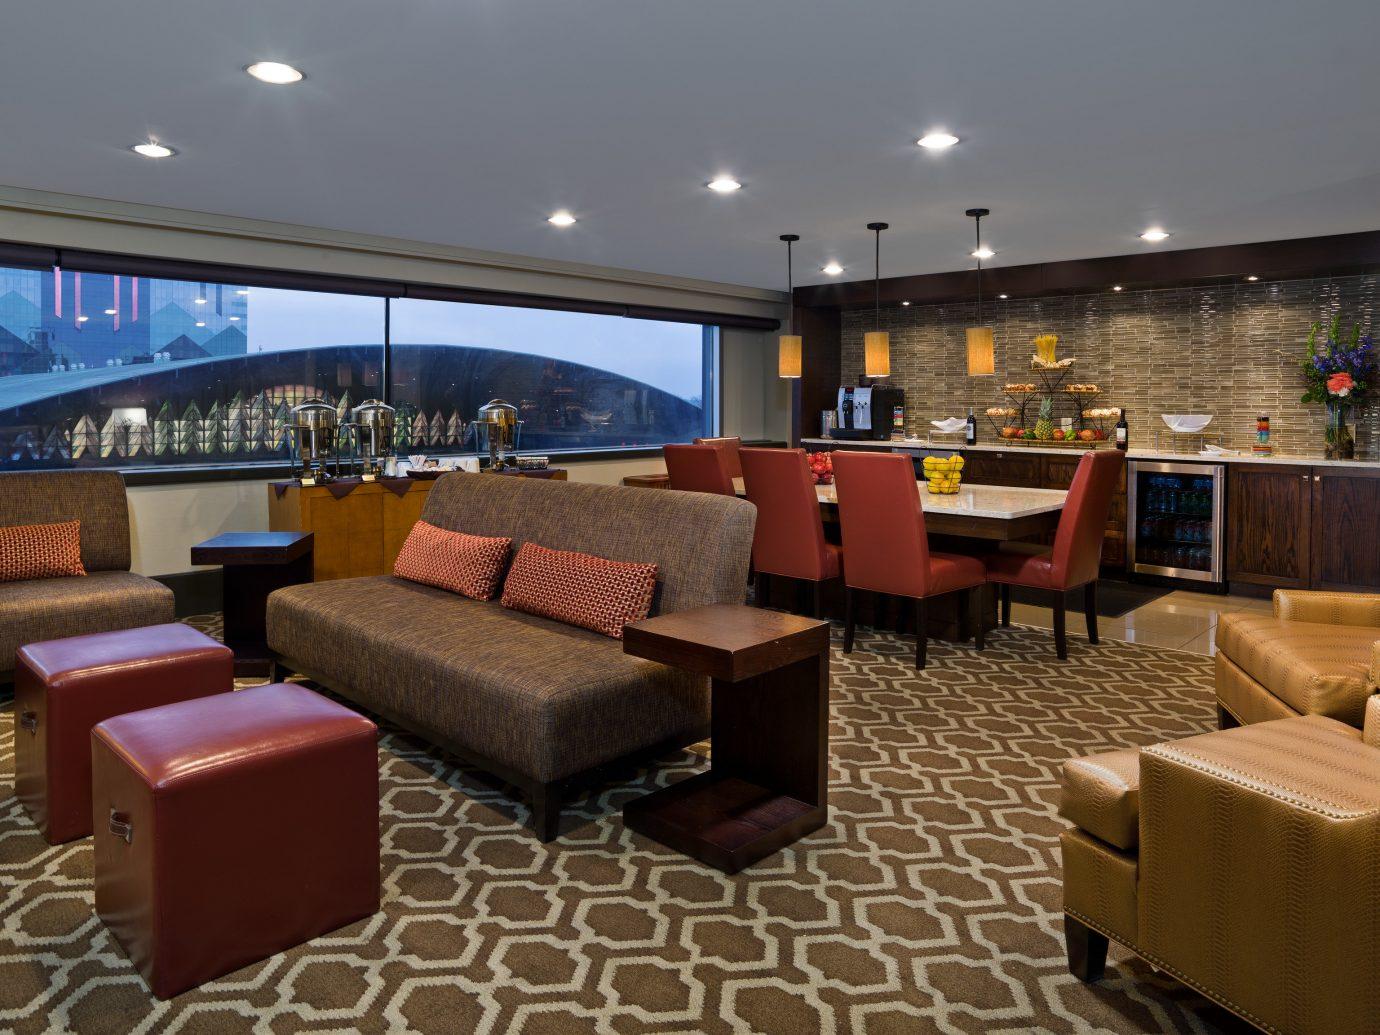 Hotels floor indoor interior design room ceiling restaurant Lobby real estate penthouse apartment furniture several